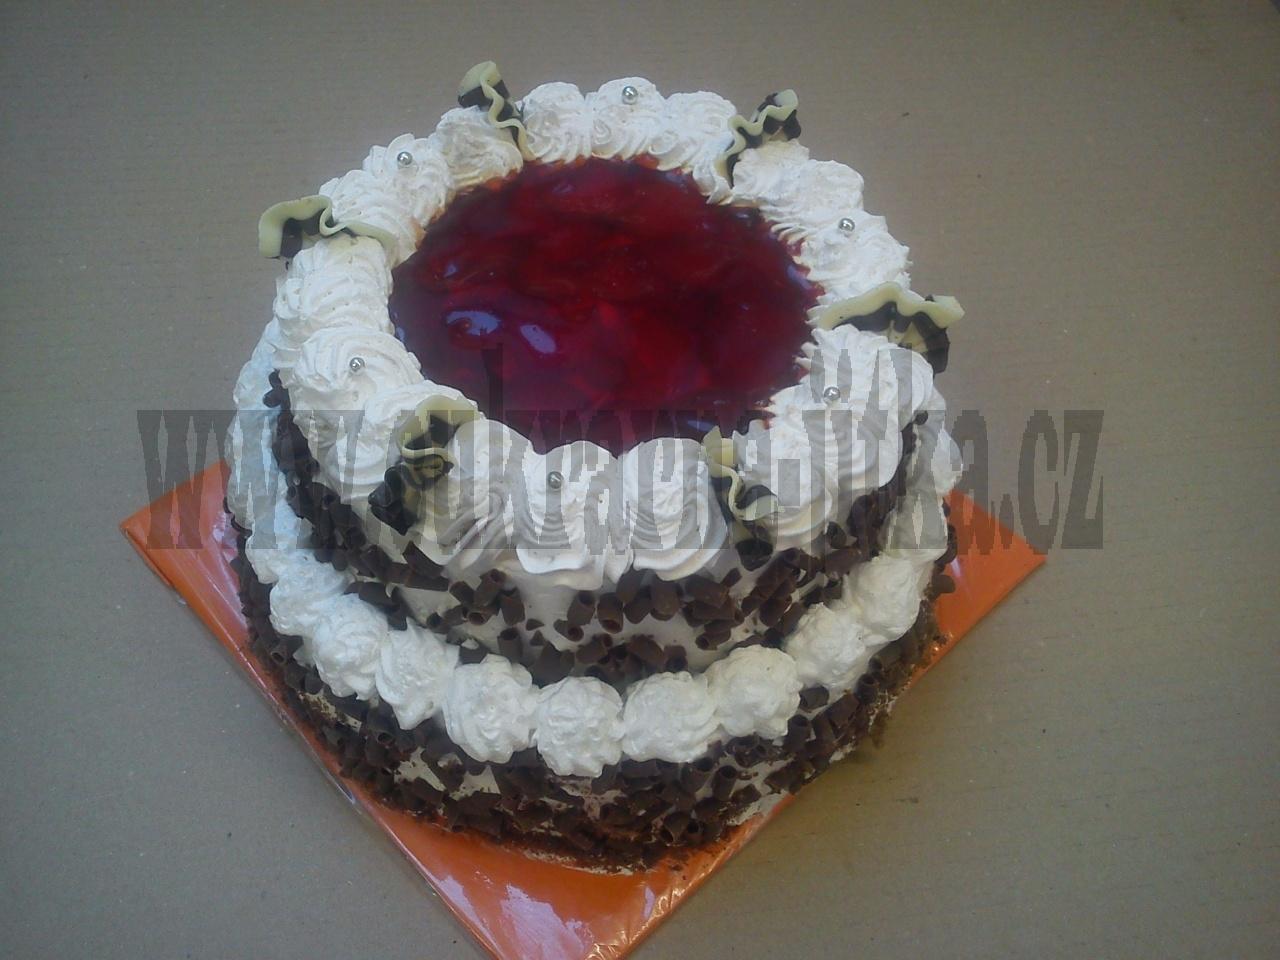 ovocný dort šlehačkový 2 patra vrch želé + jahody bok čokoládové hoblinky   č.651